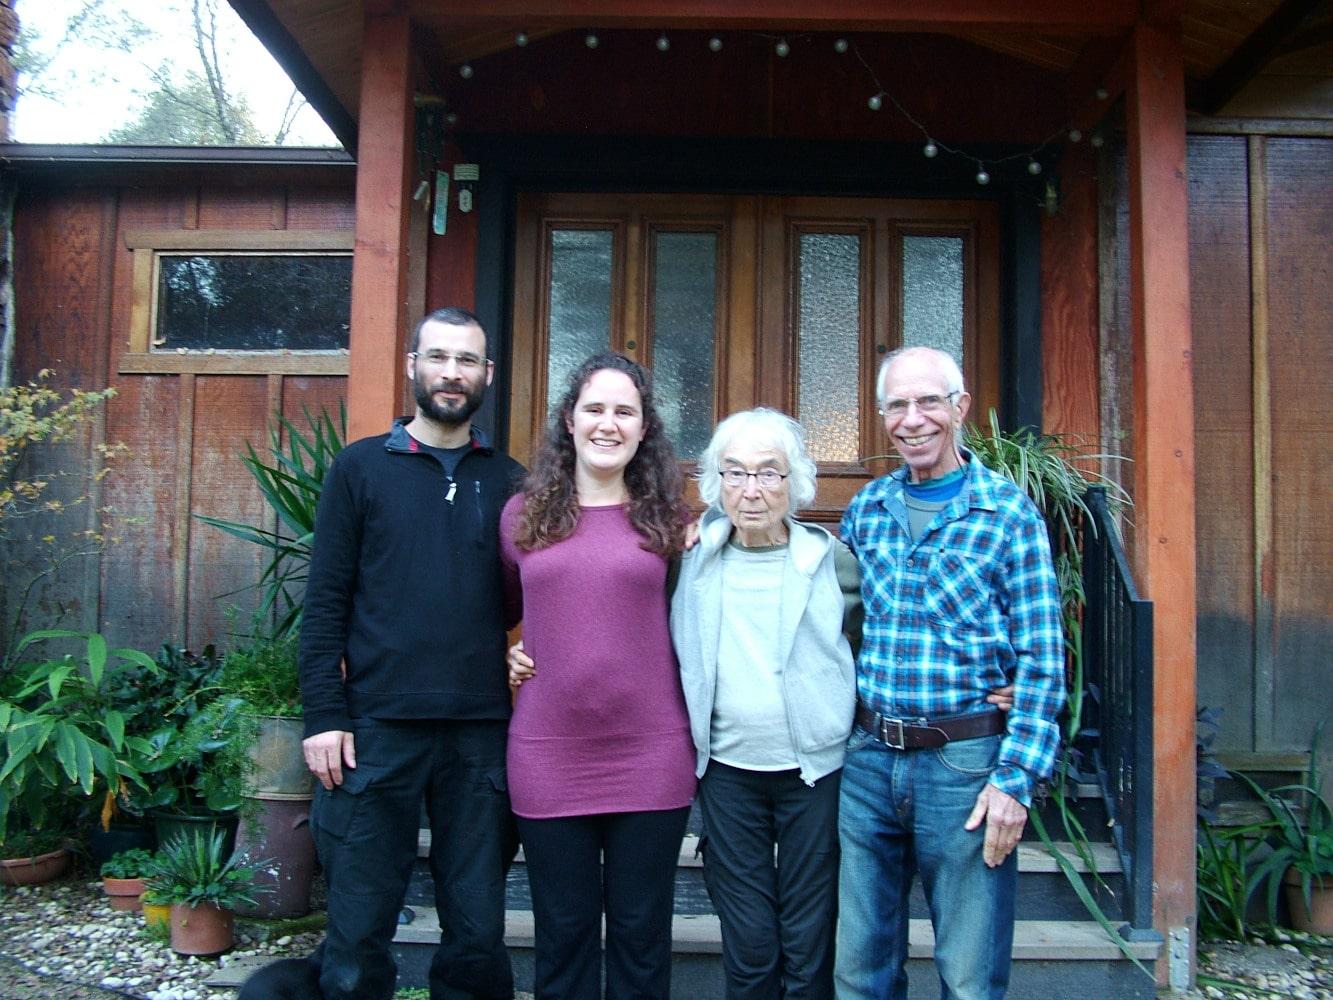 Shari and Will meet Lee and Glenn